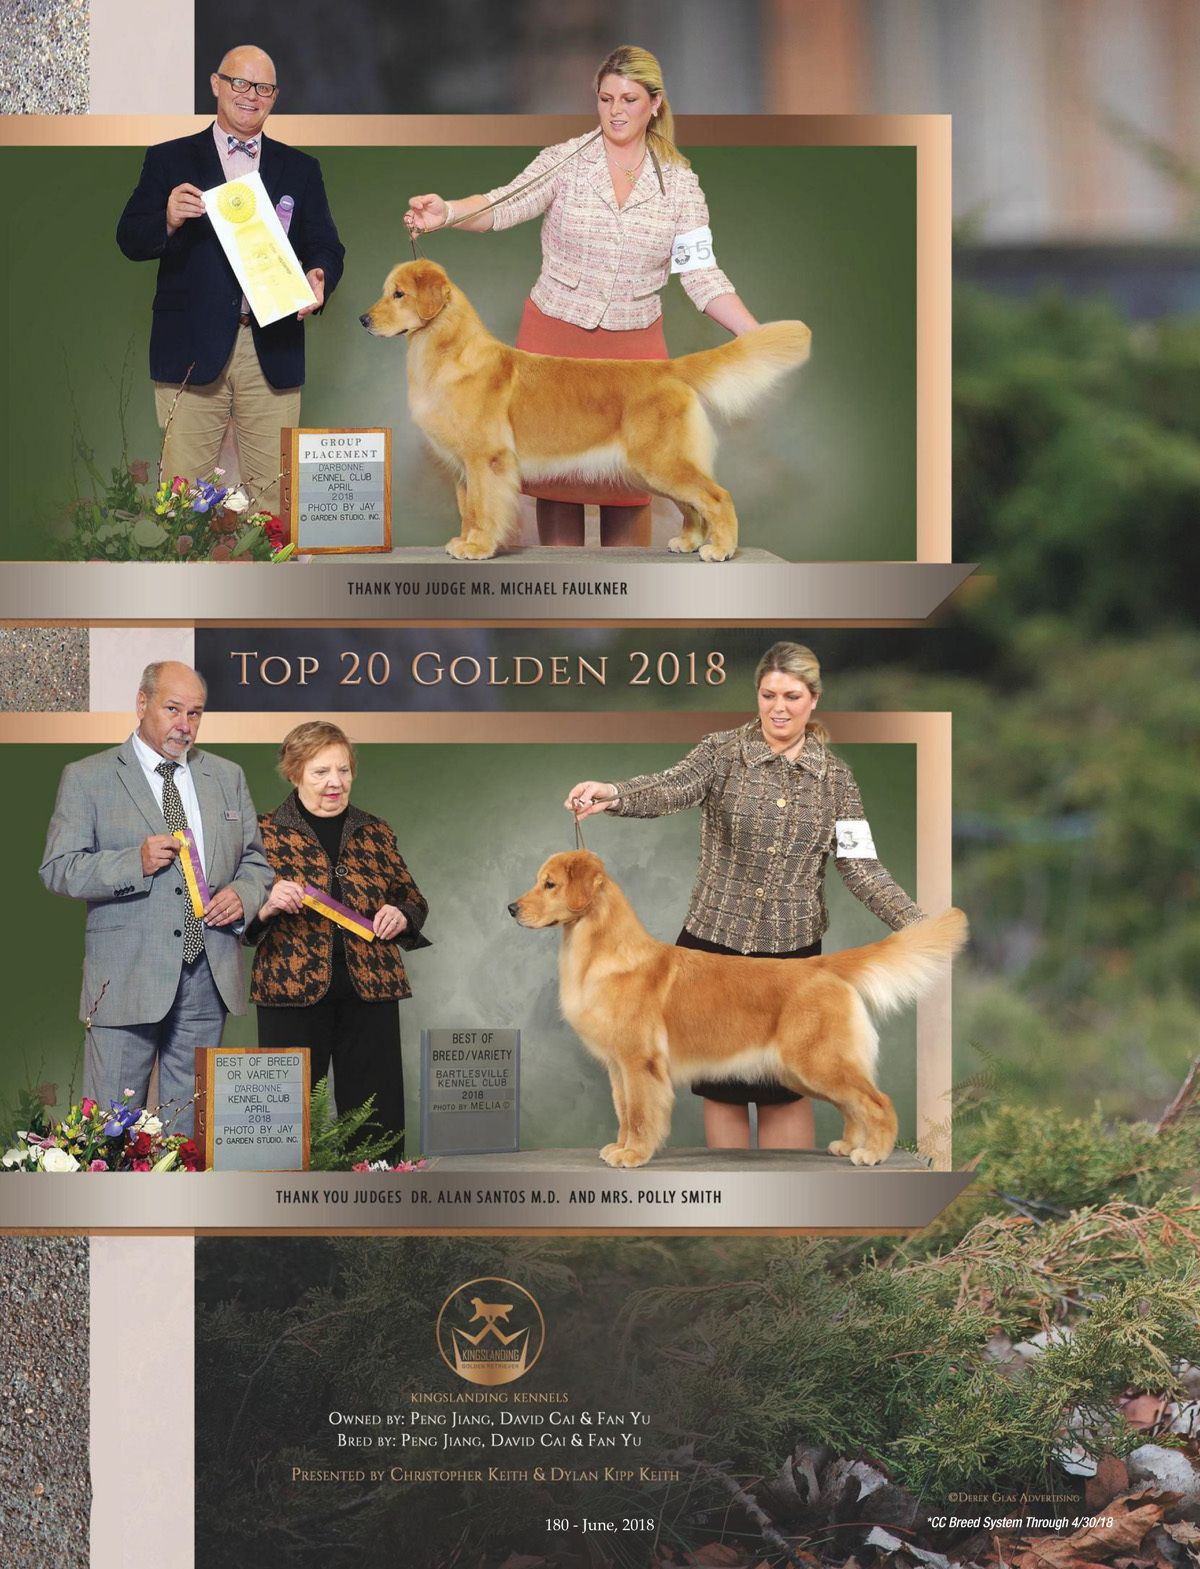 Am Gch Cnch Kingslanding S Eastern Heroine Dj 4 1 2016 Golden Retriever Golden Retriever Breeds Corgi